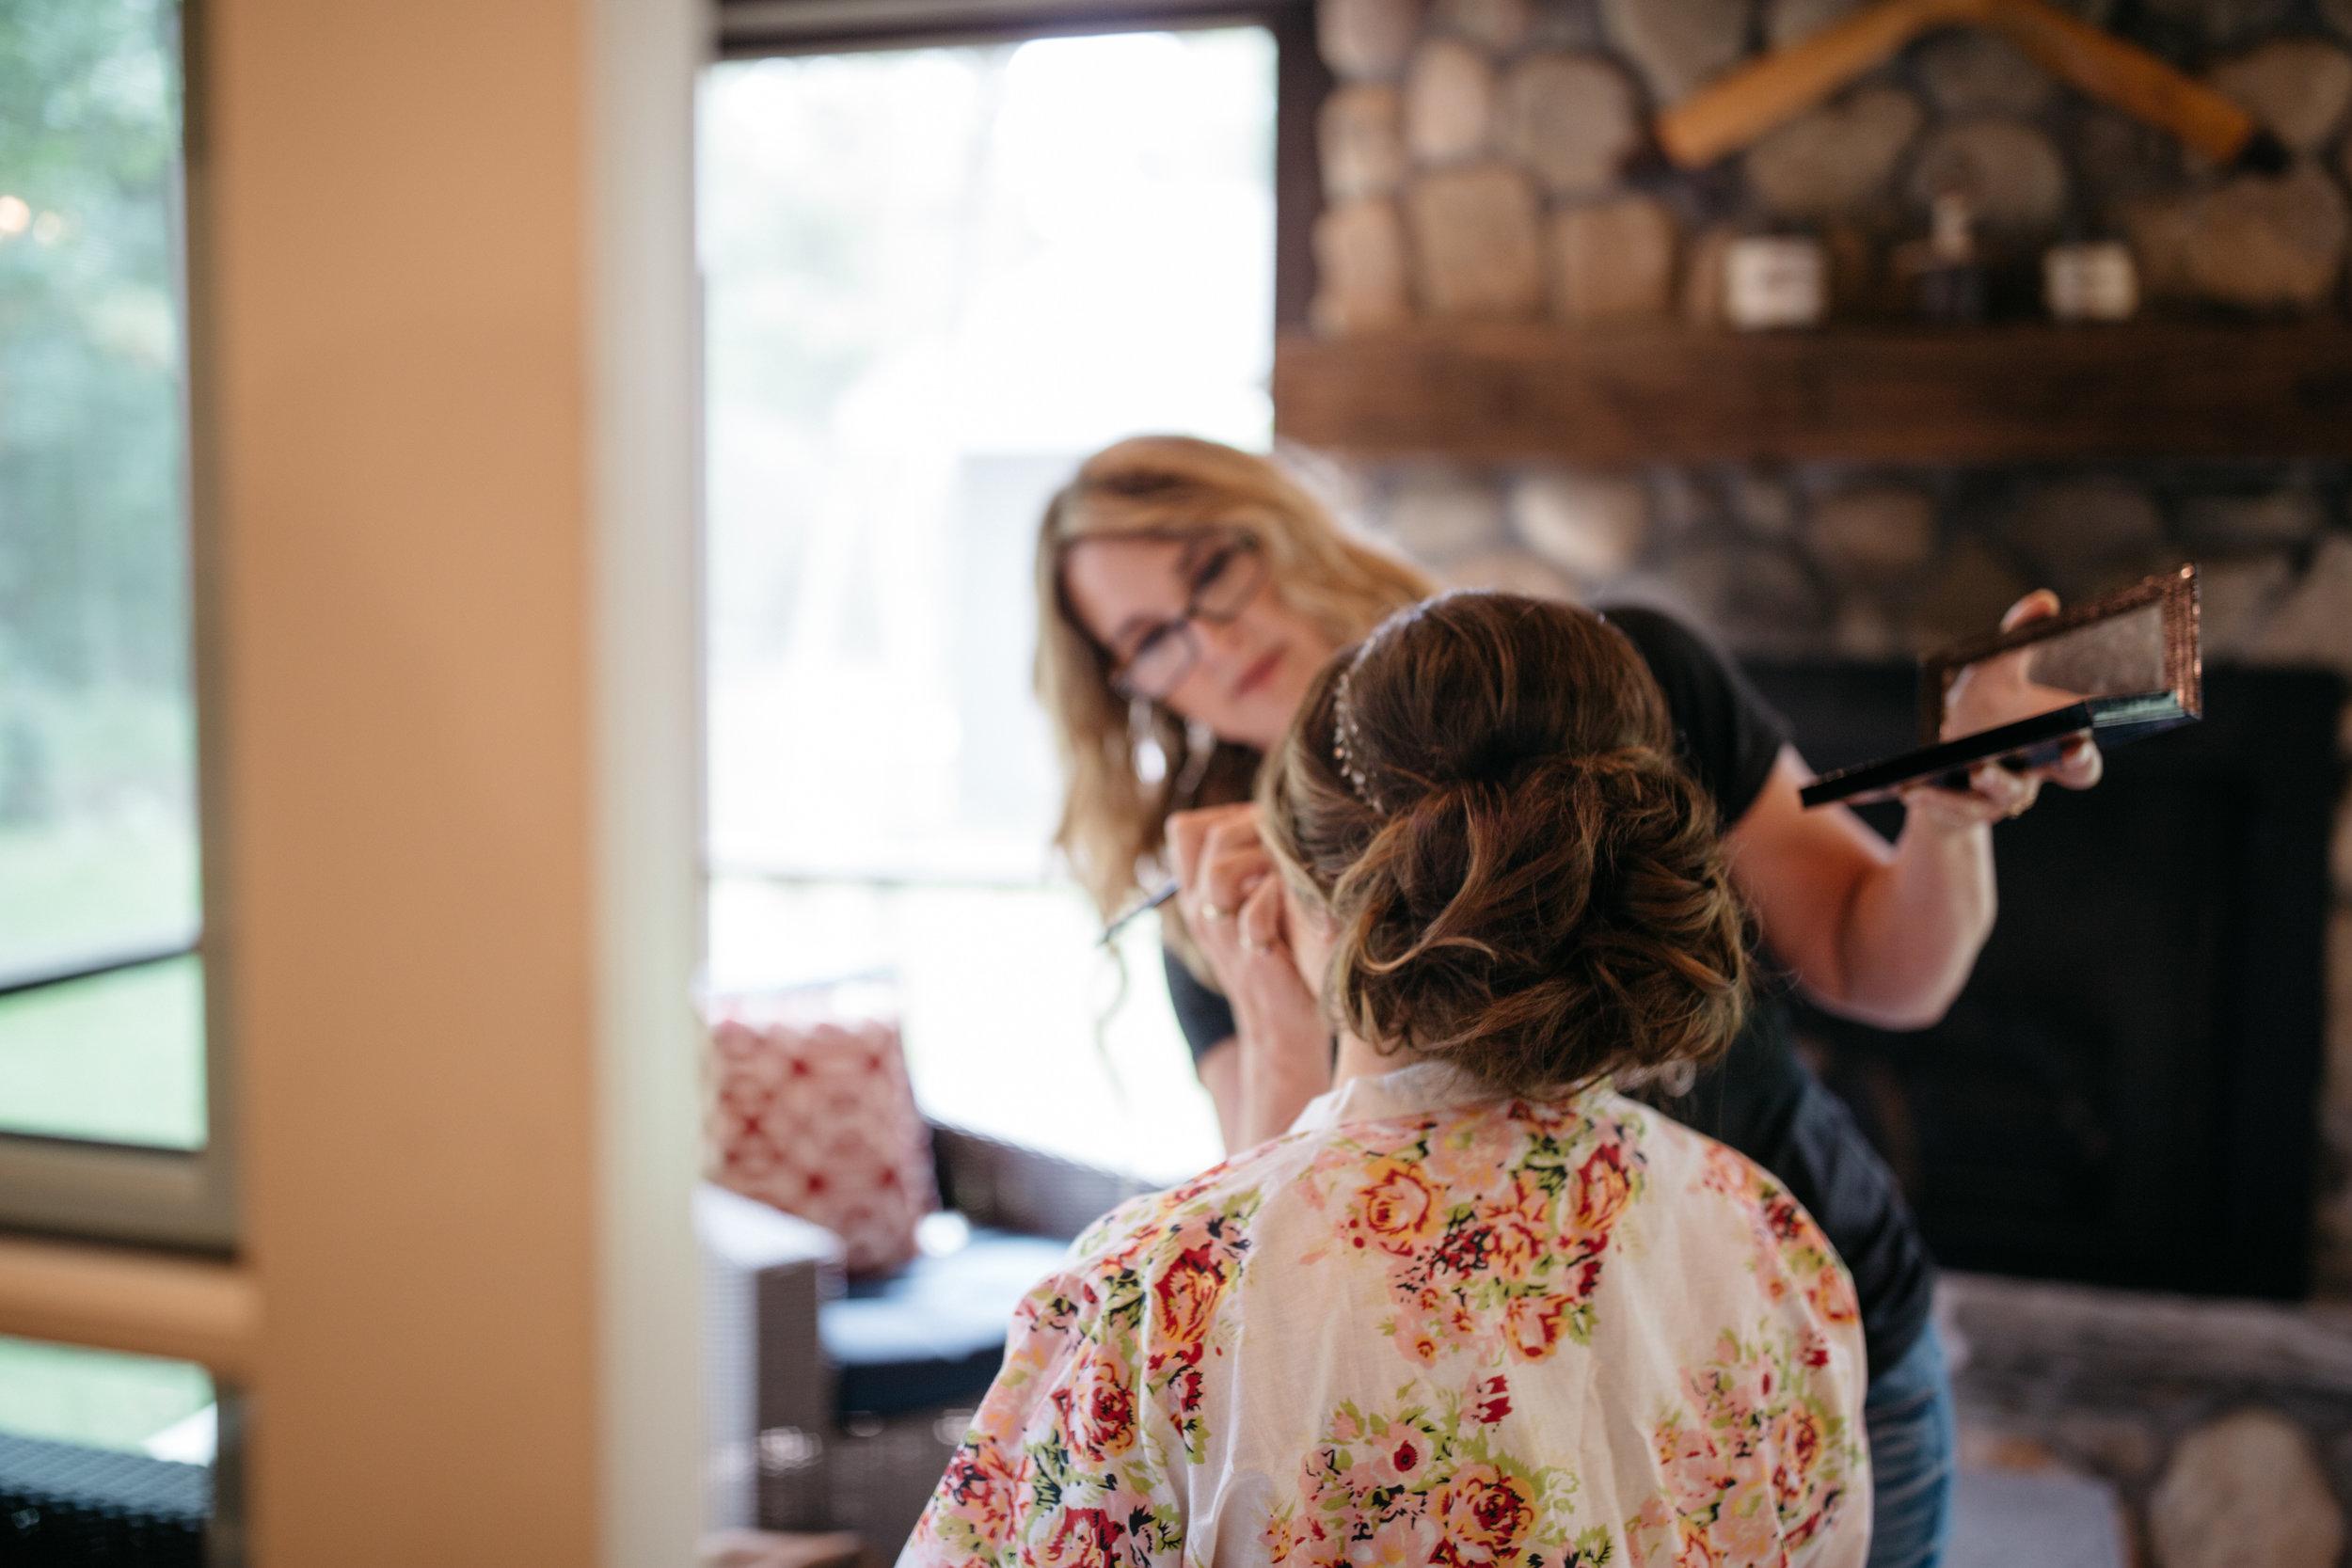 Bride getting ready at Grand View Lodge cabin. Wedding photography by Britt DeZeeuw, Brainerd photographer